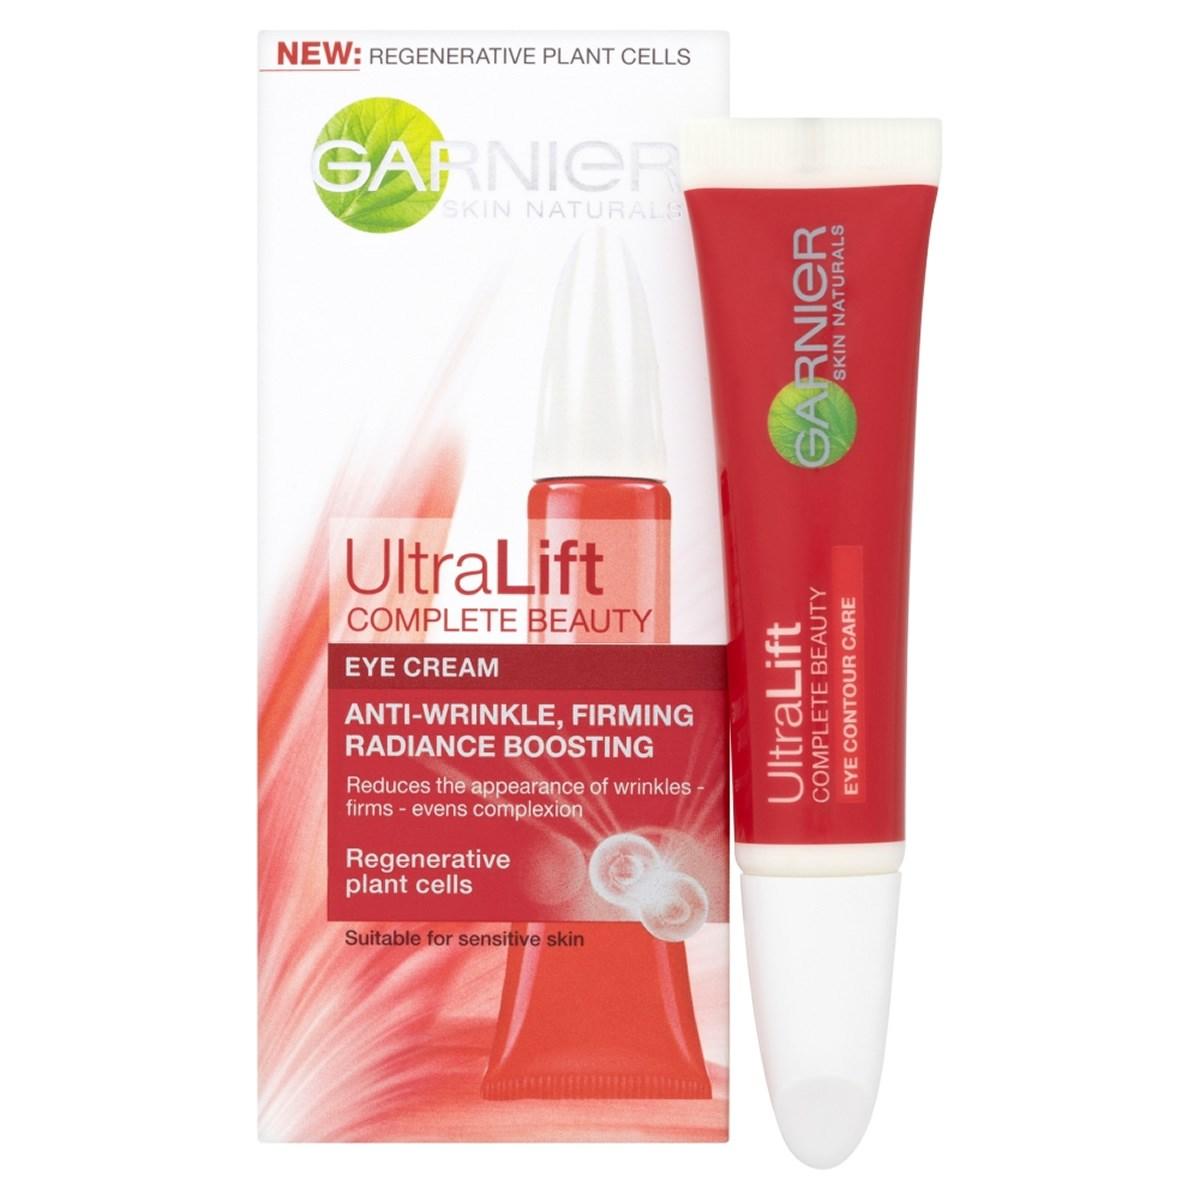 Garnier Ultra Lift Complete Beauty Eye Cream